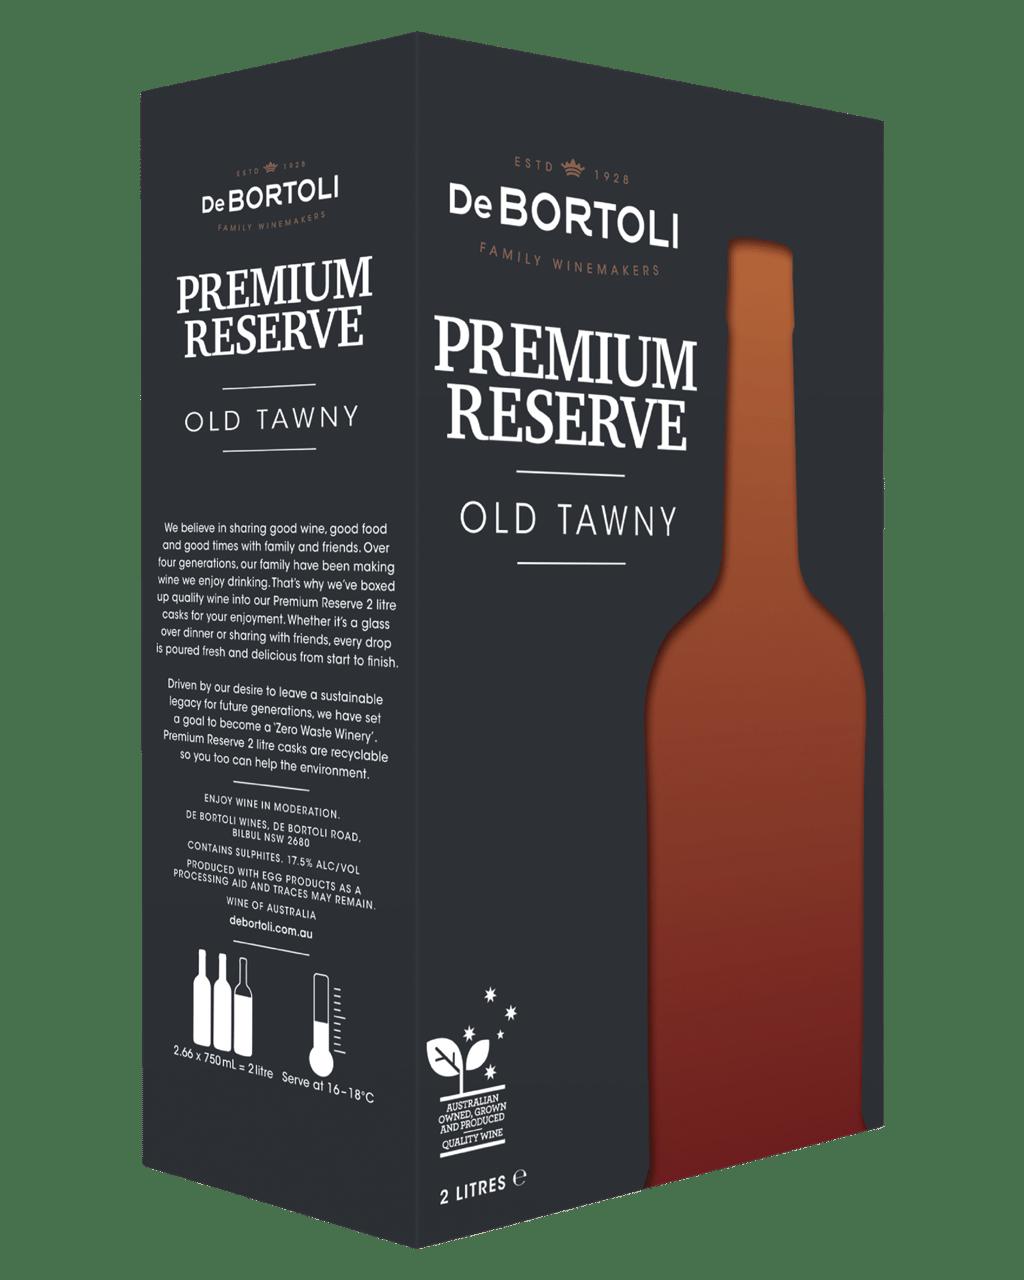 De Bortoli Premium Reserve Tawny 2l Dan Murphys Buy Wine Topup 220 Diamonds Mobile Legend Champagne Beer Spirits Online